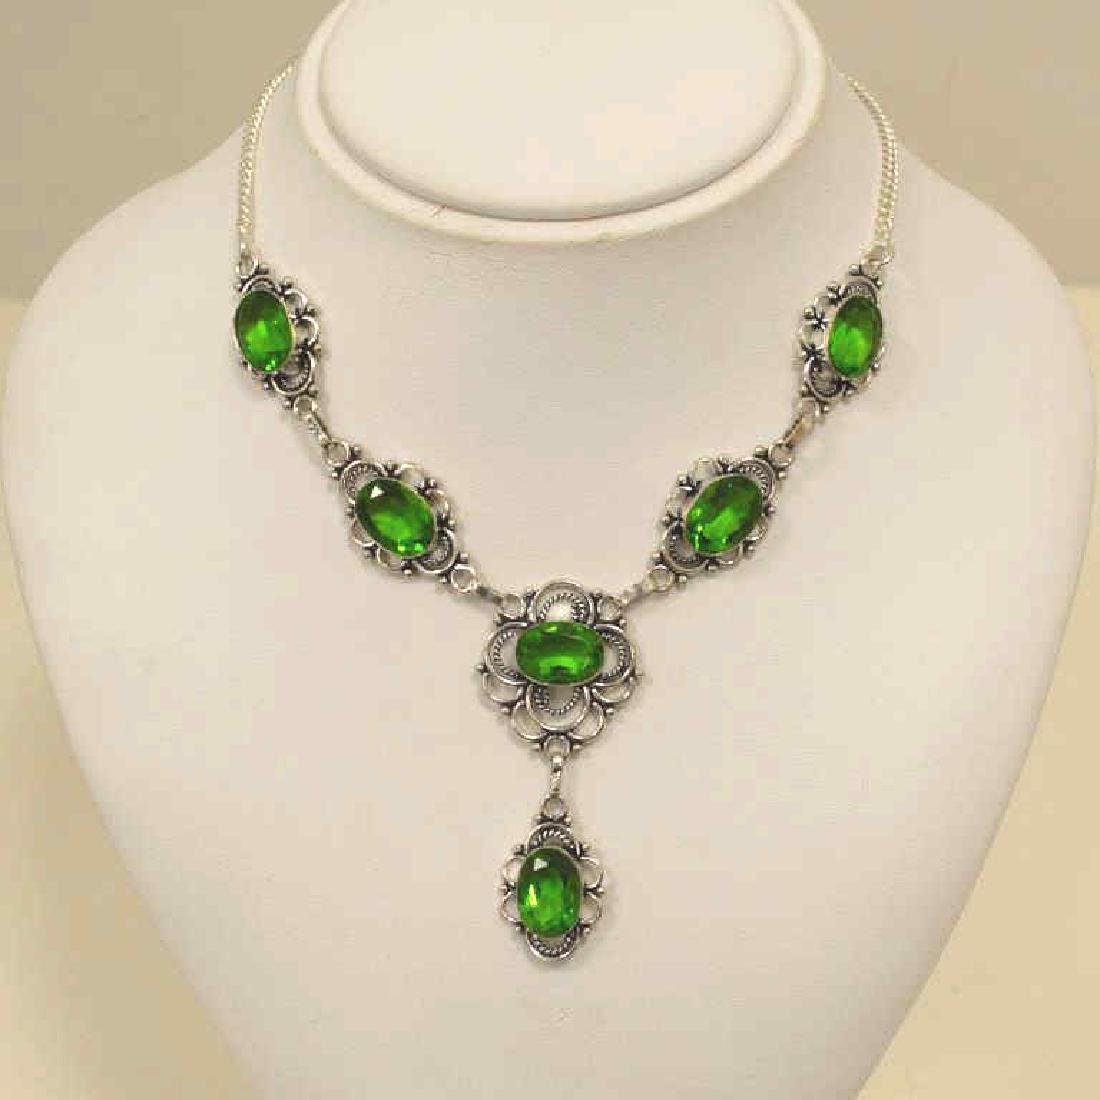 Electric green quartz necklace